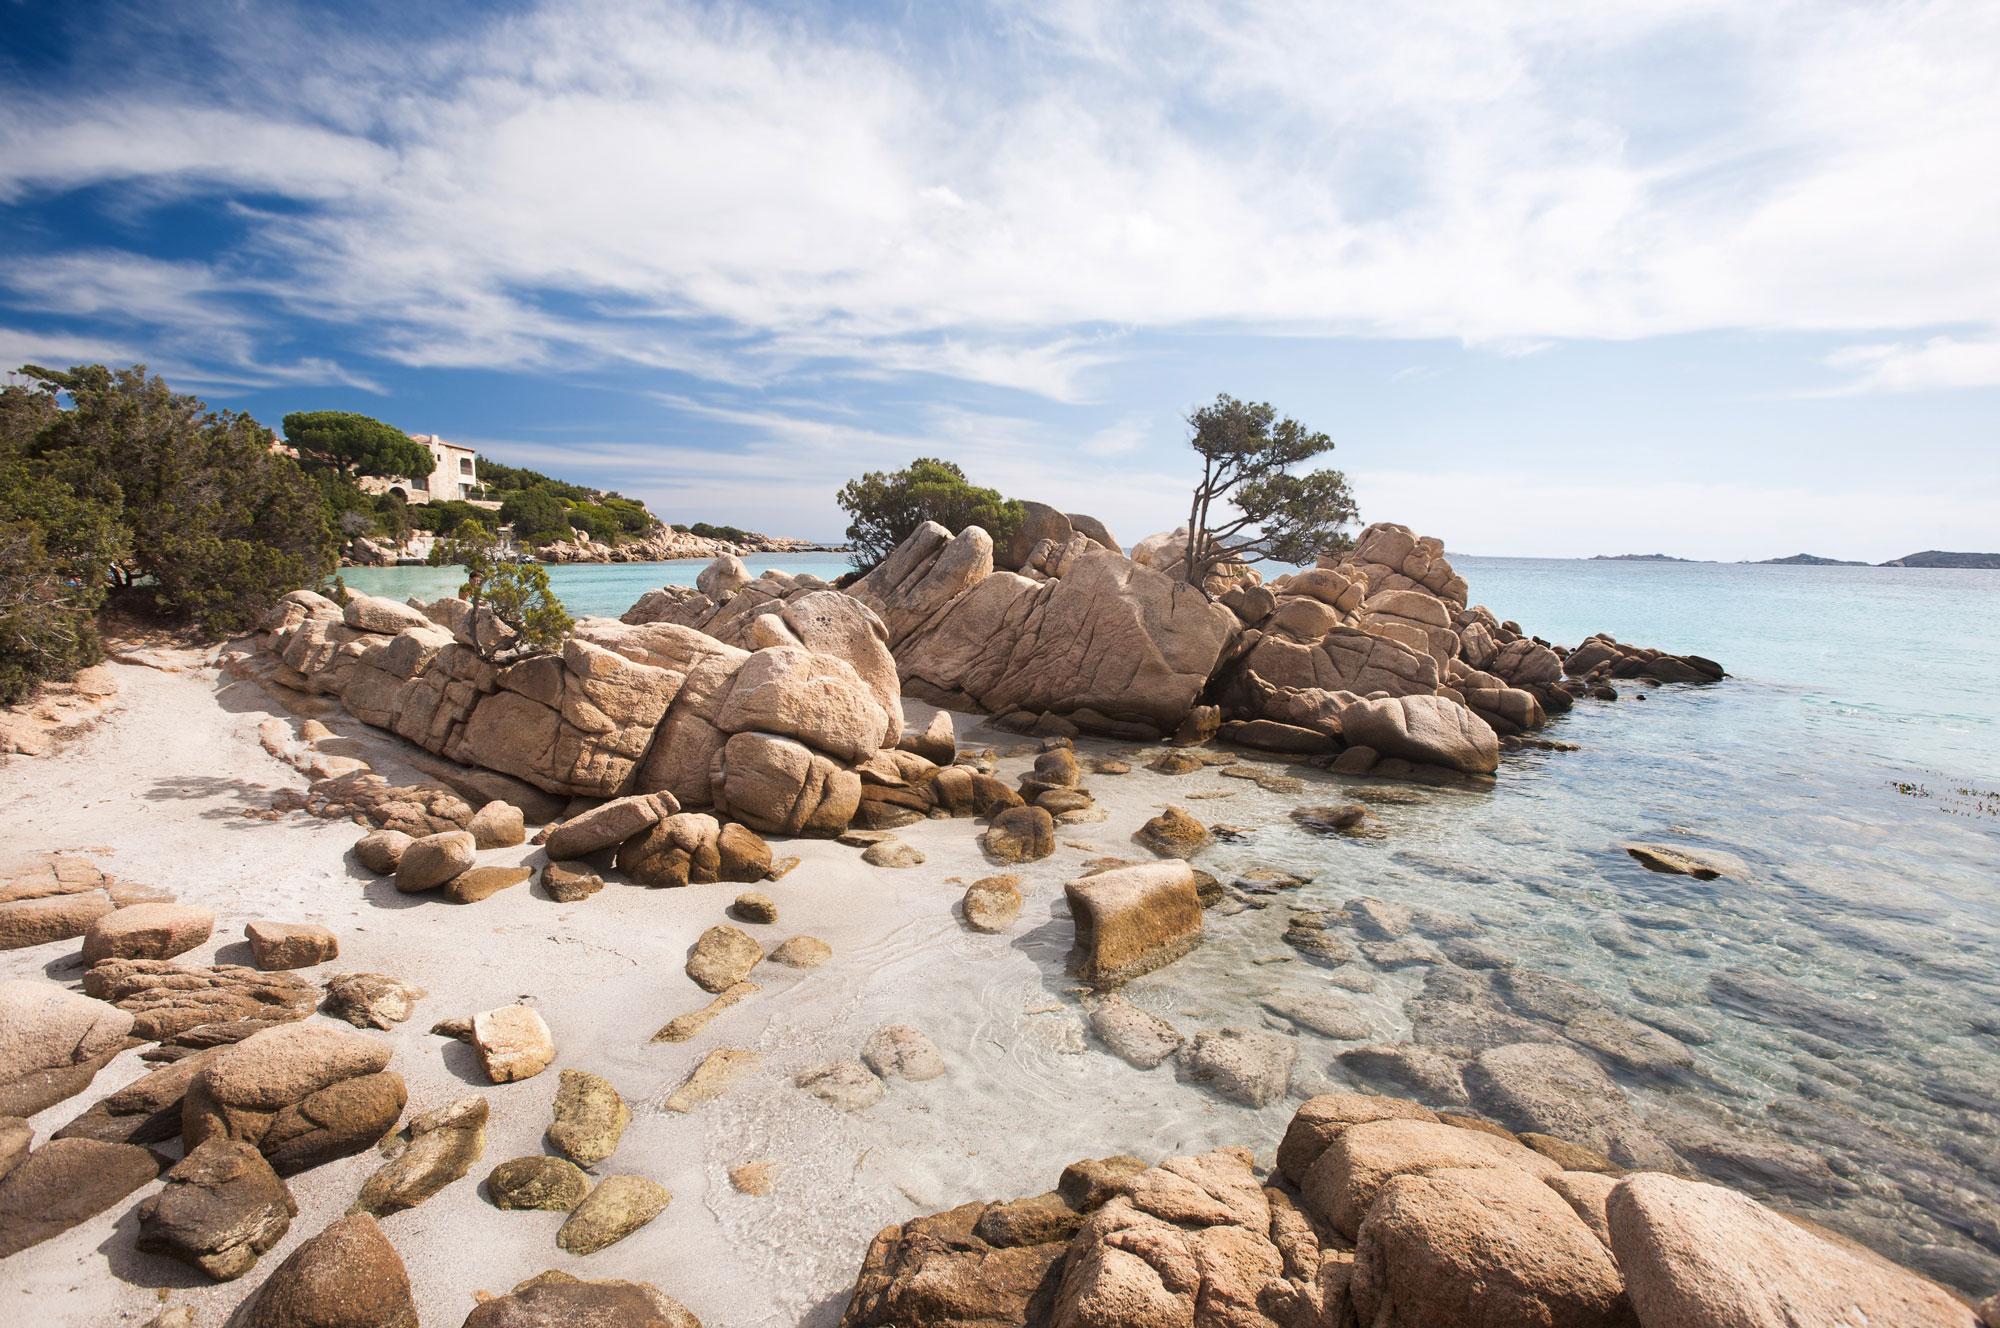 Cala Capriccioli, Costa Smeralda, Sardegna